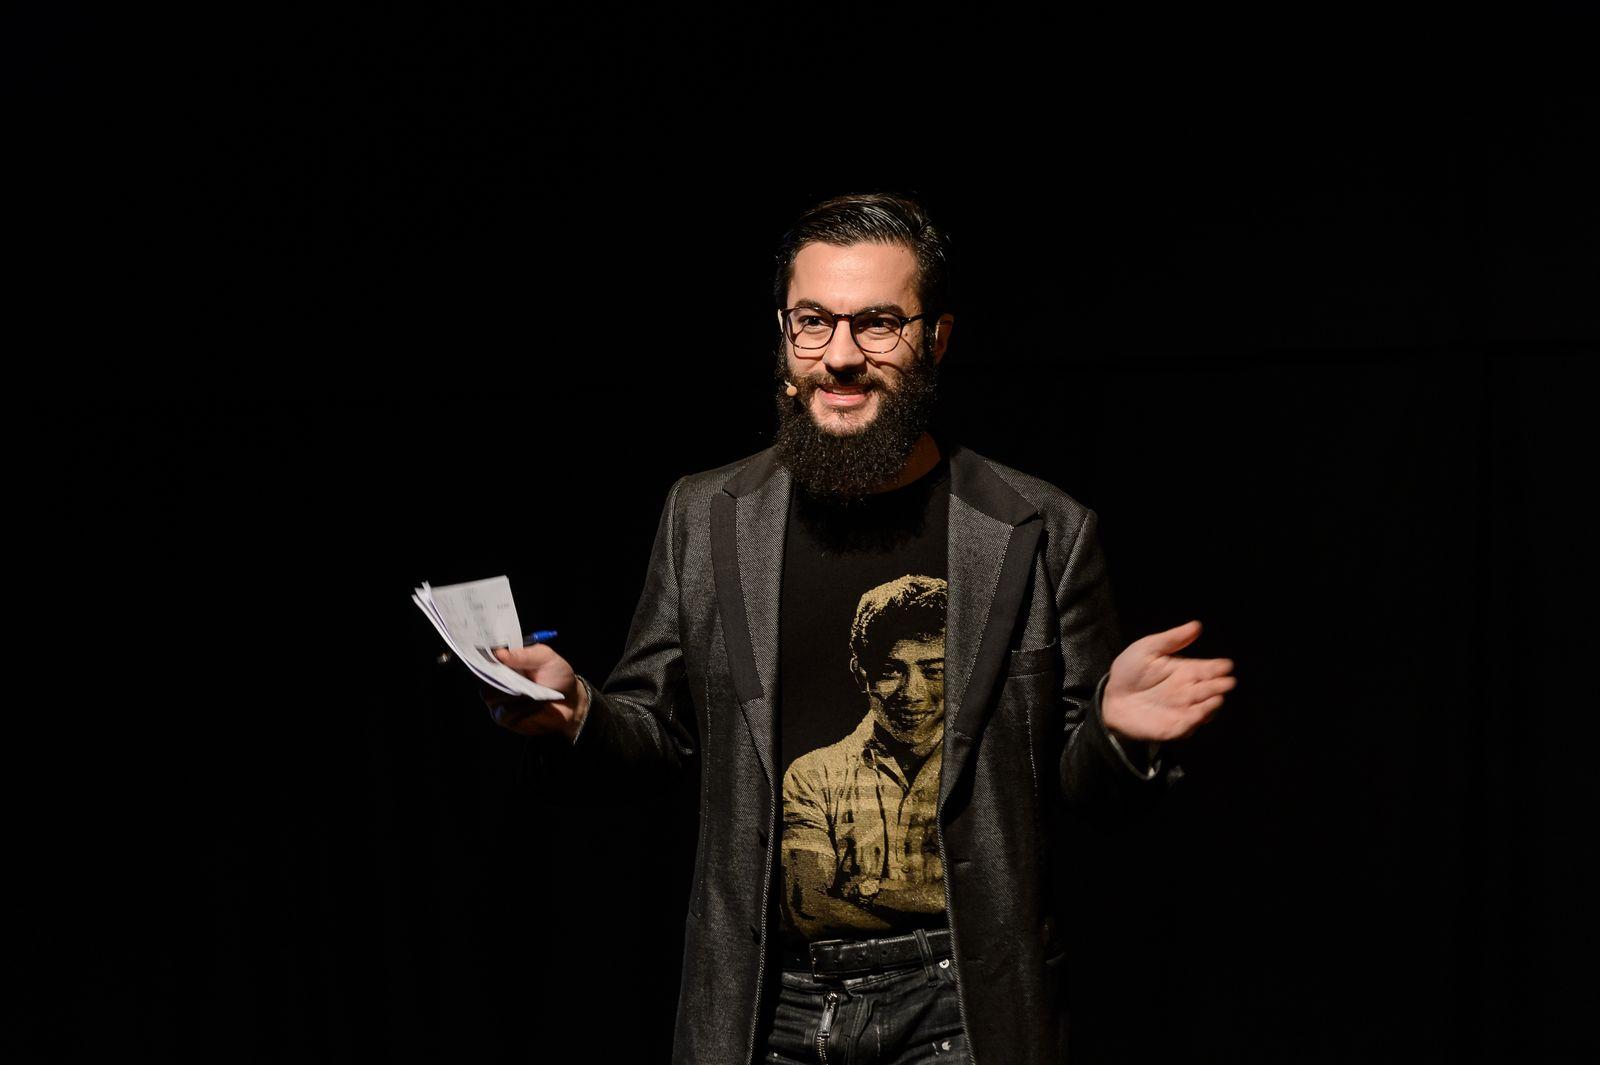 Ehssan Dariani